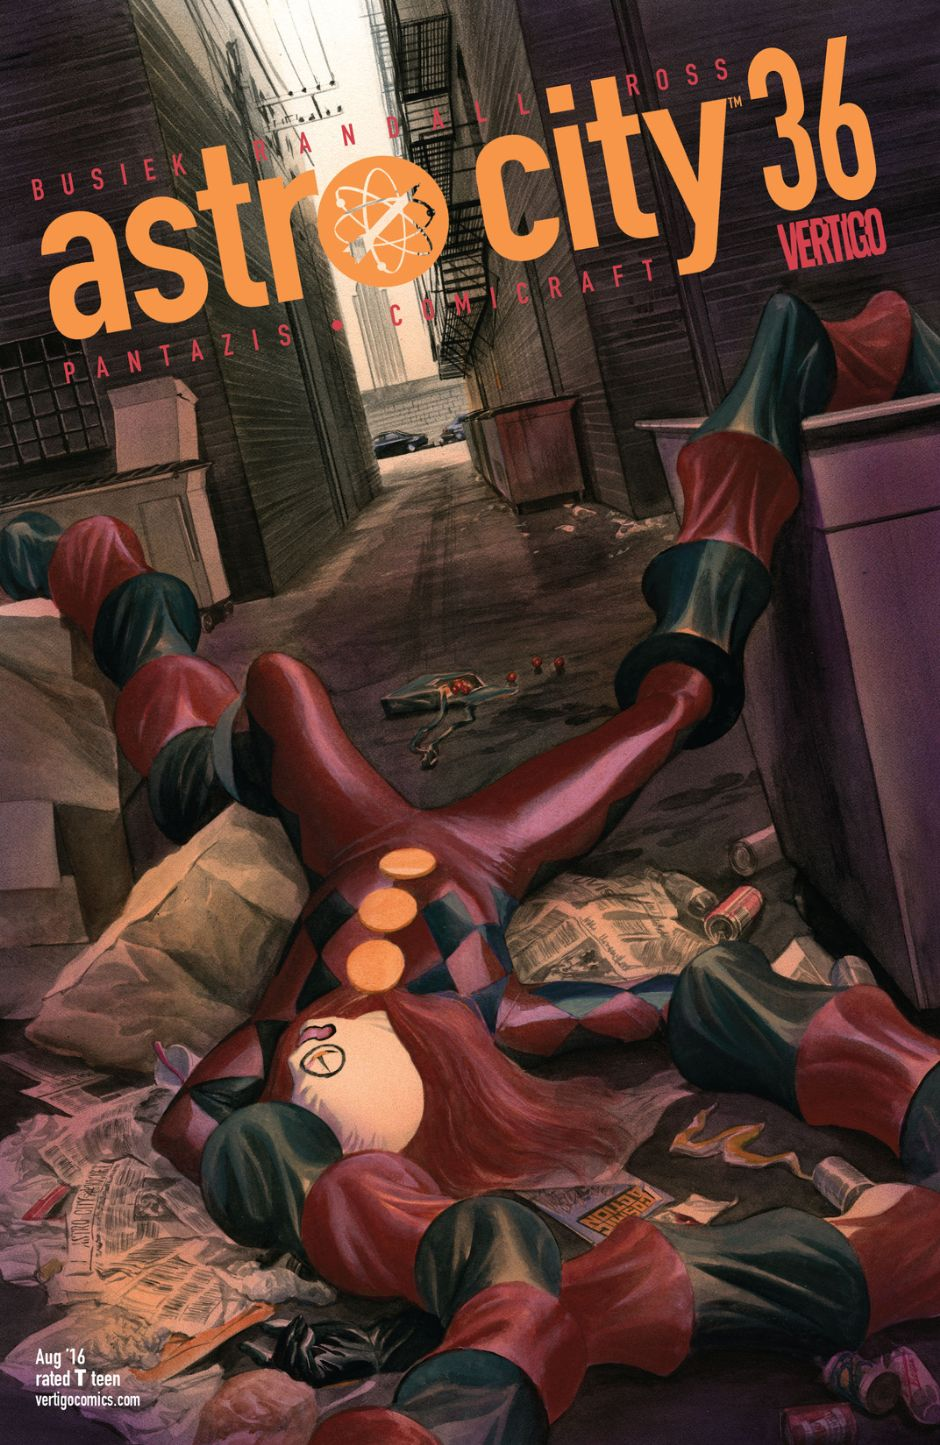 Astro City Vol 3 36